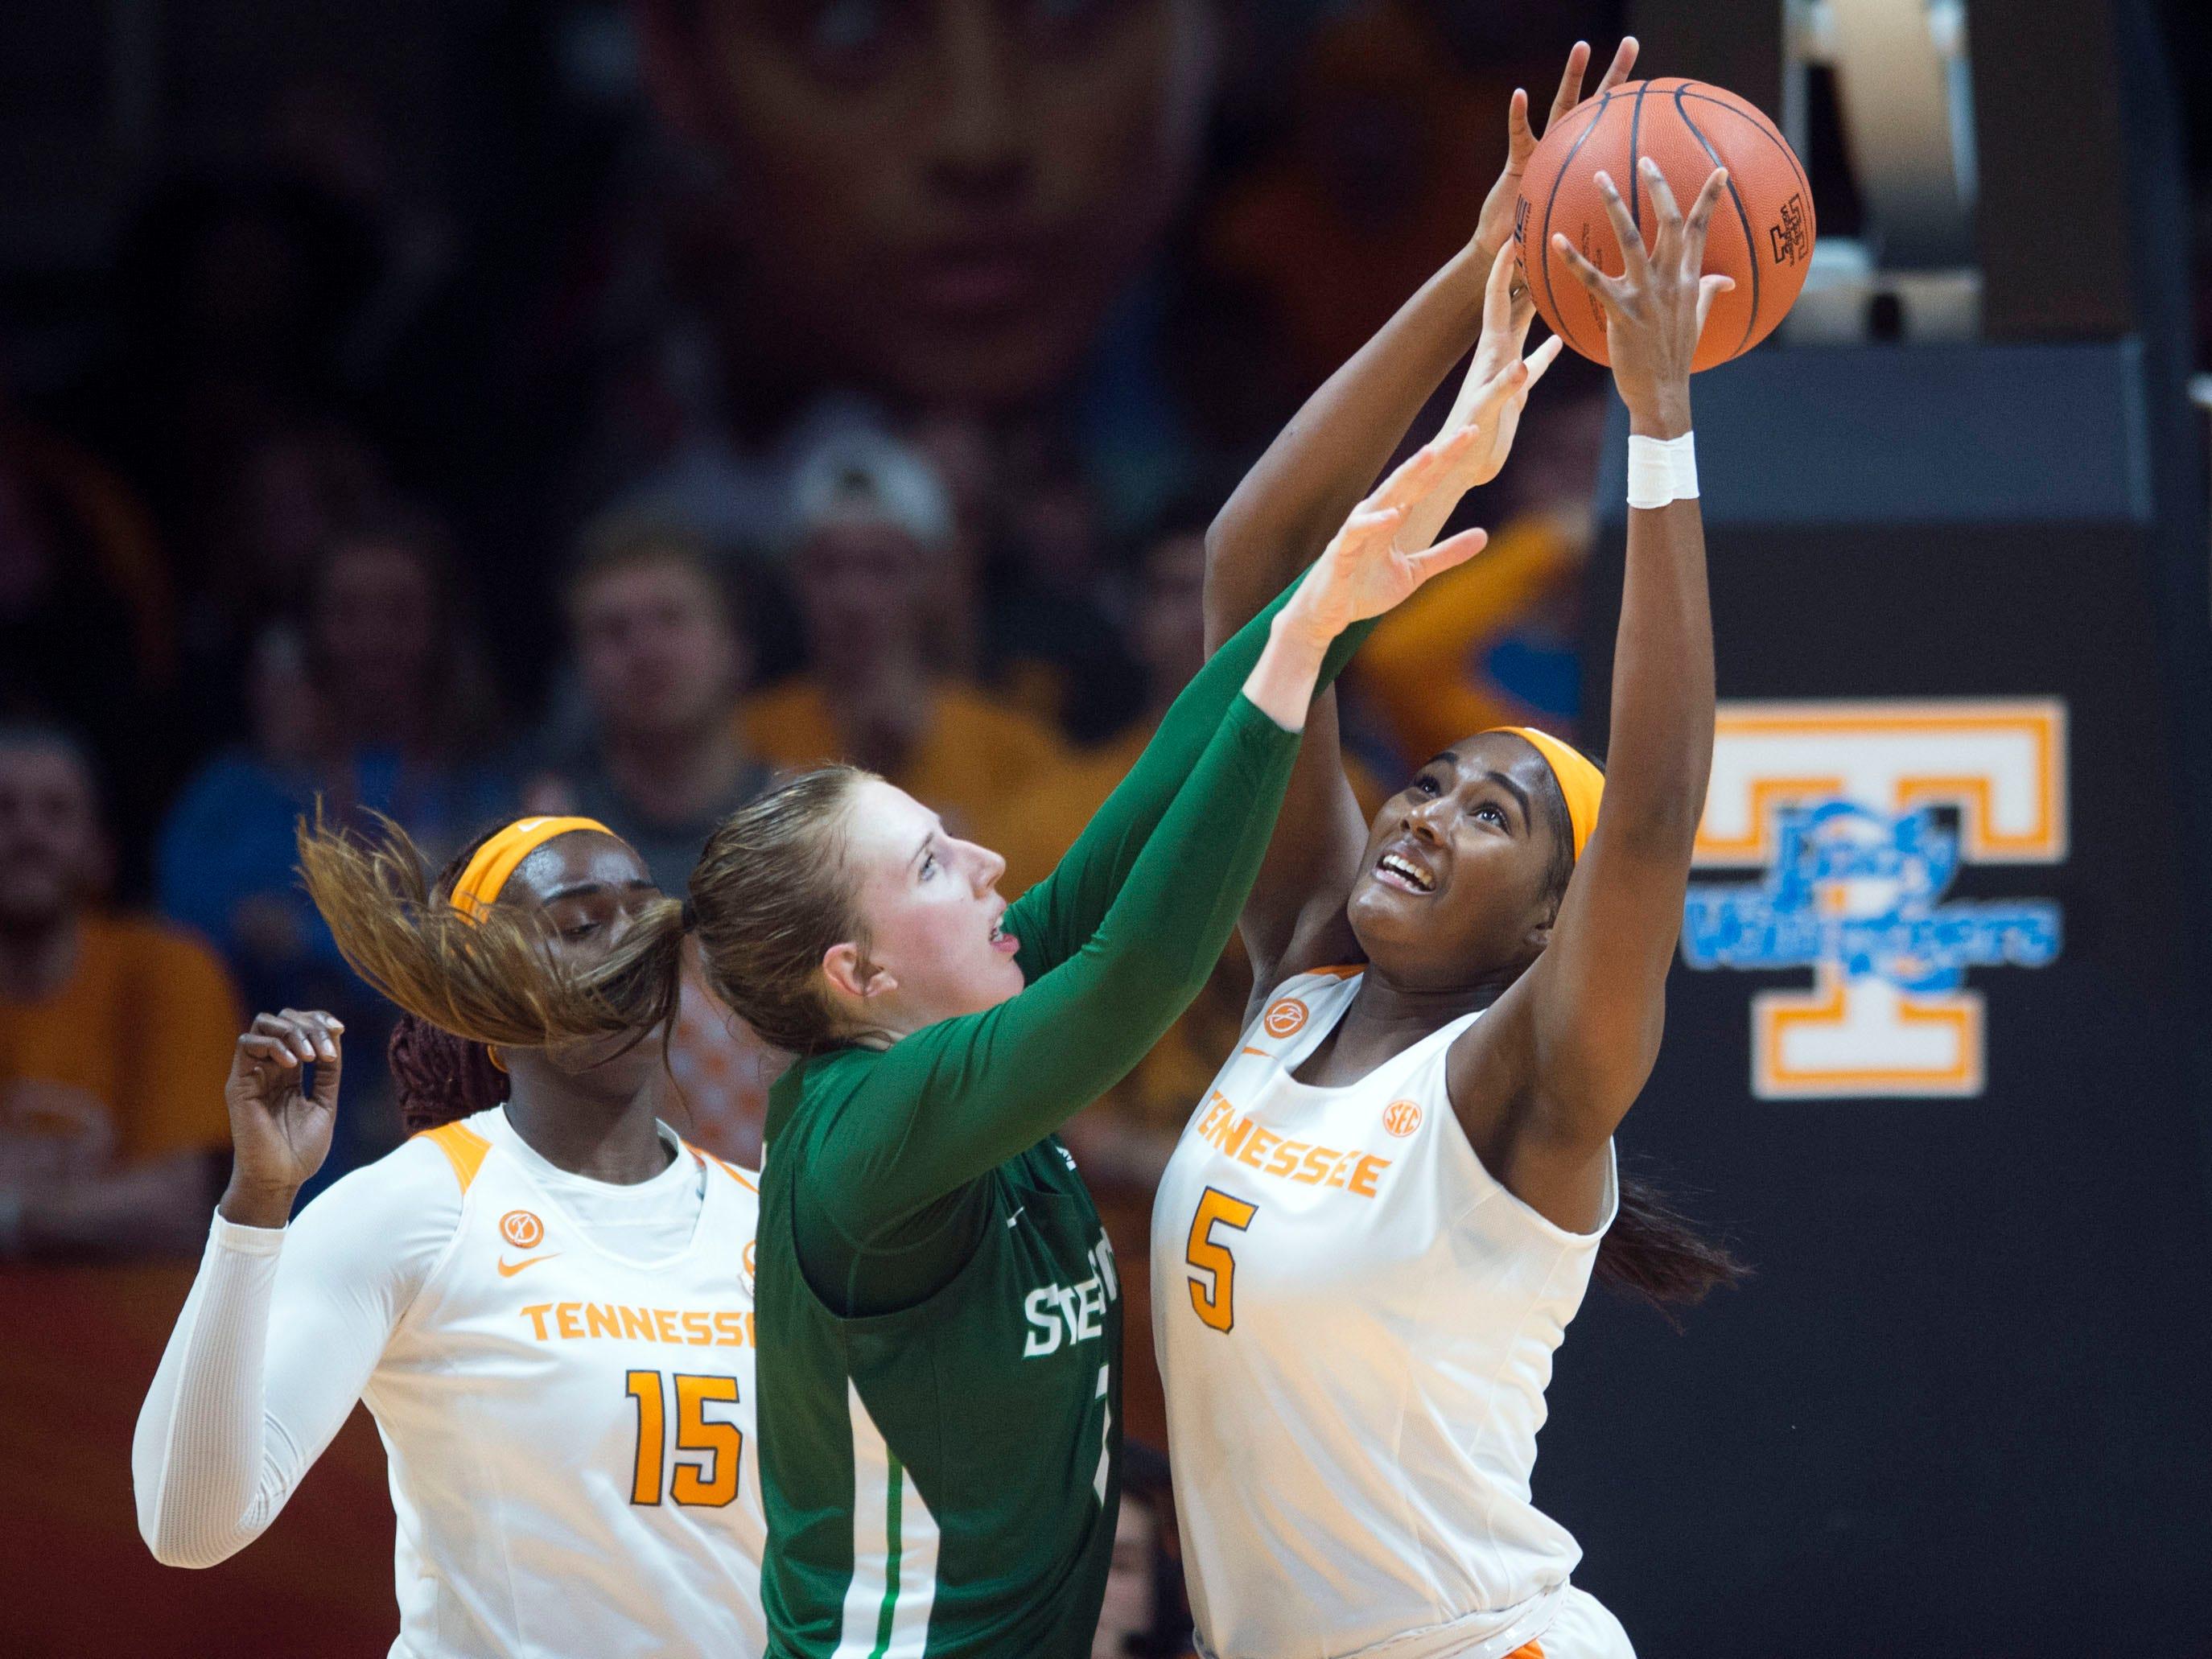 Tennessee's Kamera Harris (5) gets the rebound over Stetson's Sarah Sagerer (1) on Wednesday, December 5, 2018.